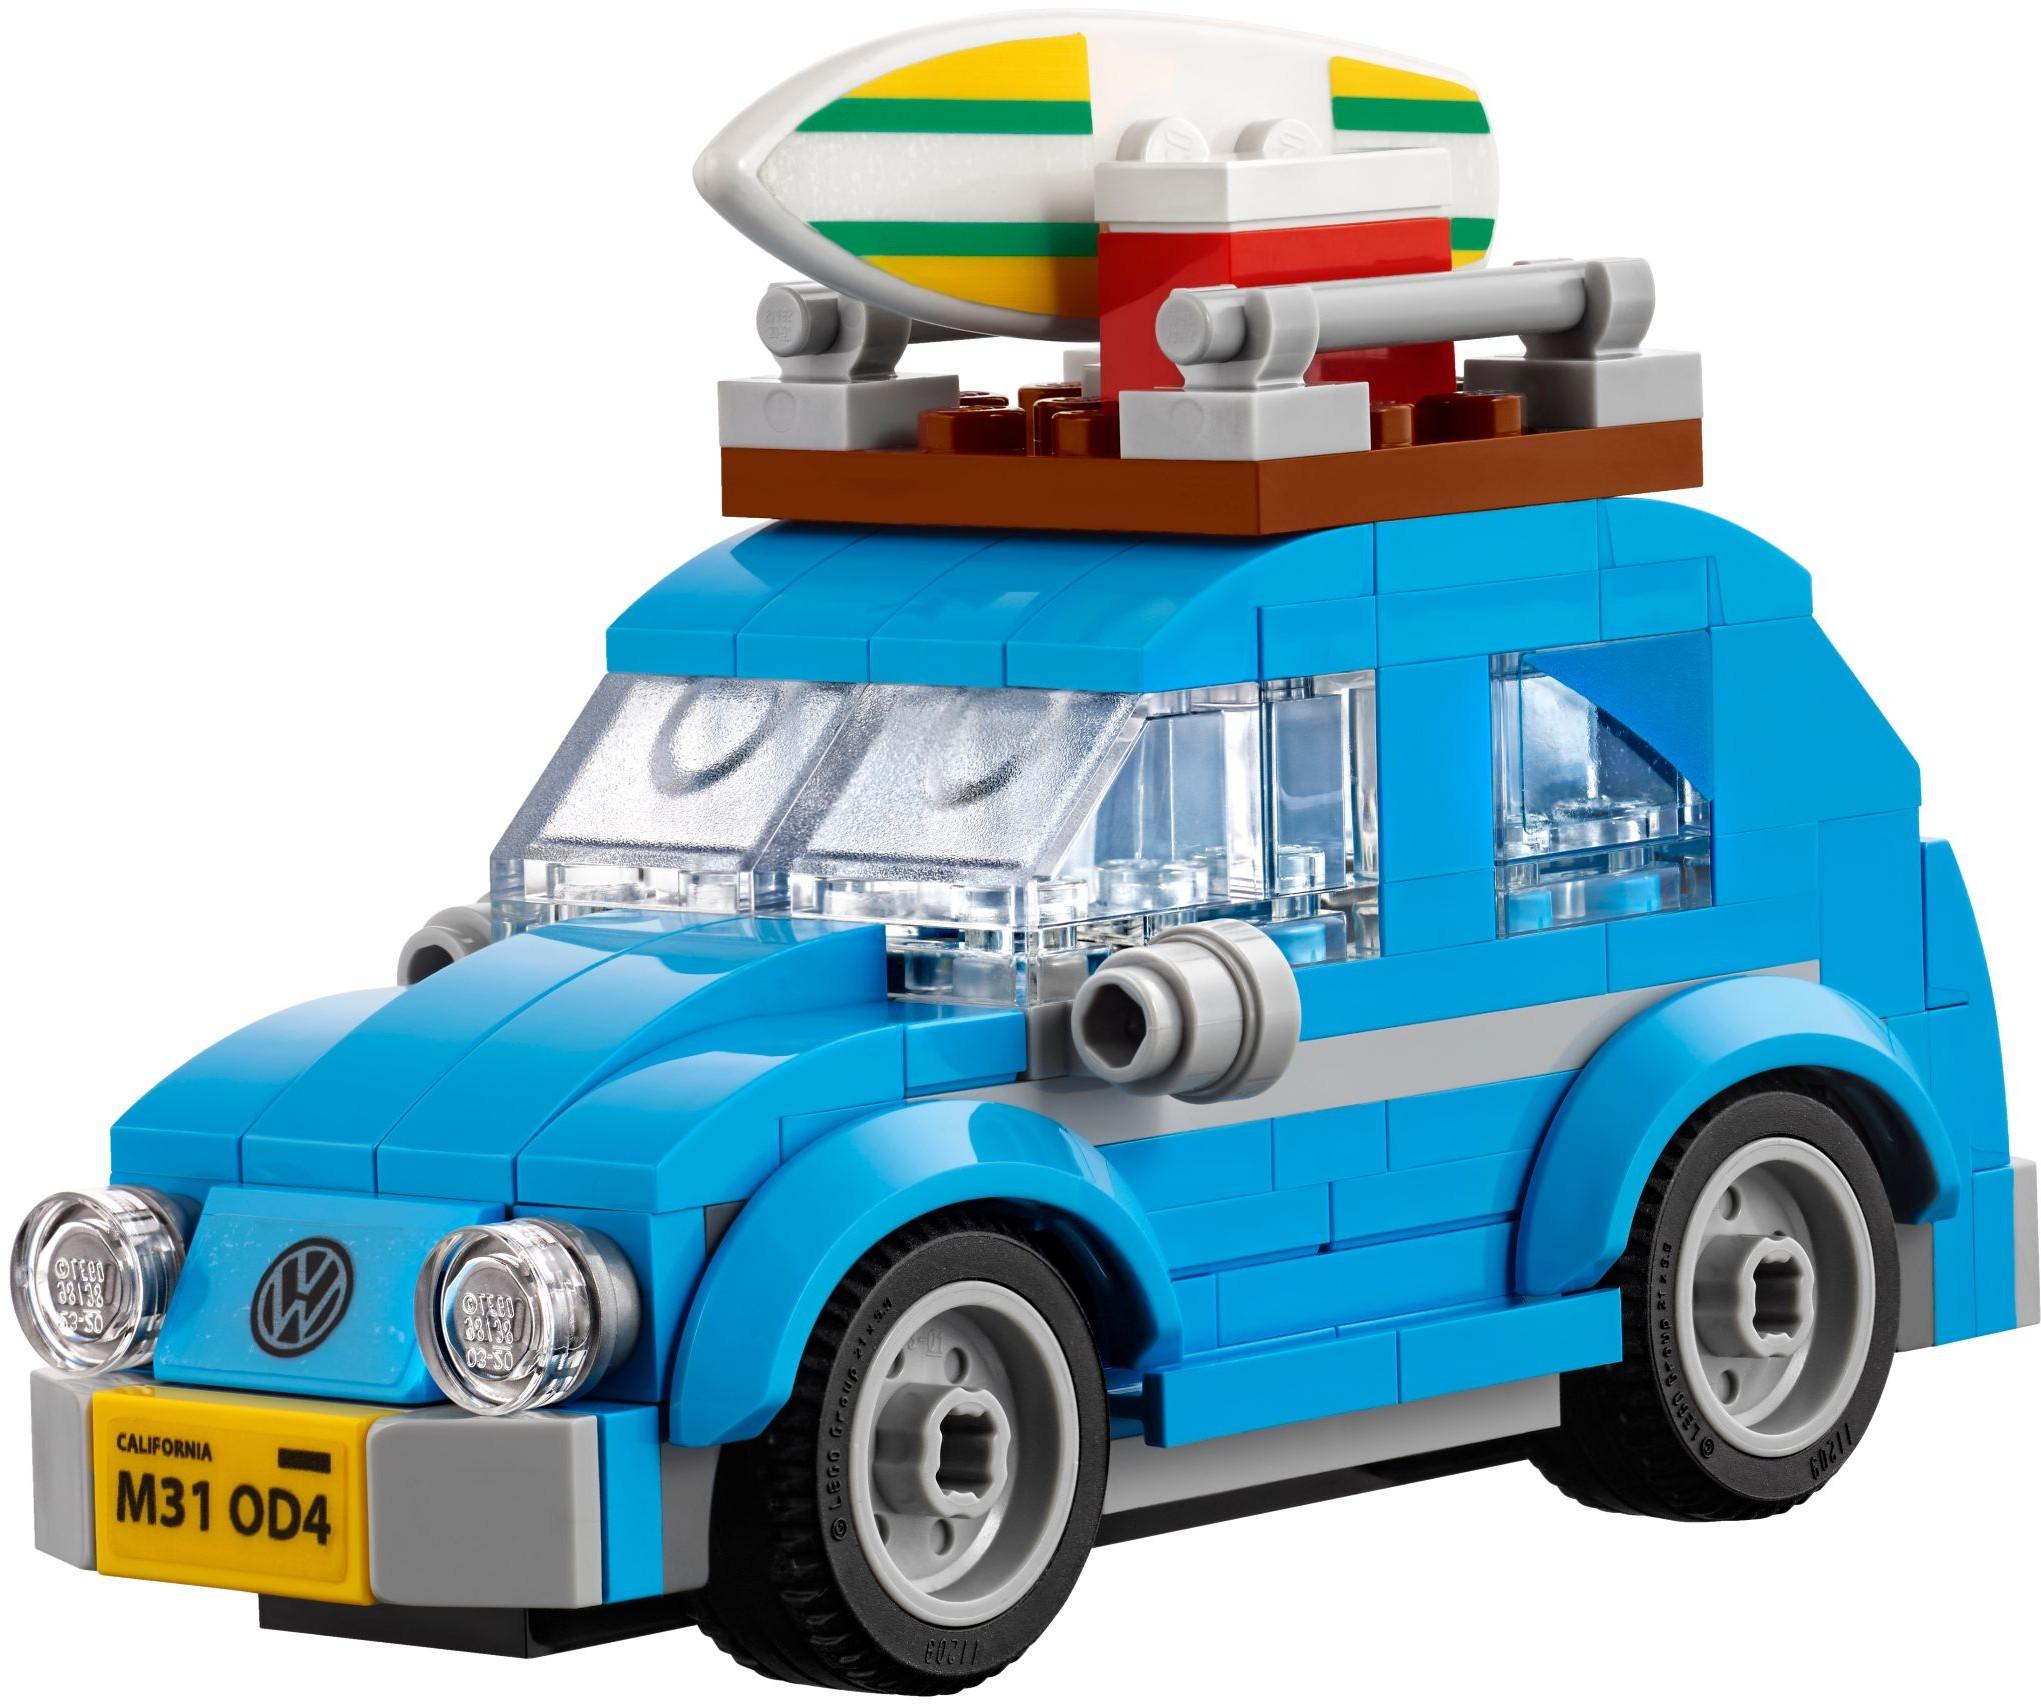 Tagged Volkswagen Brickset Lego Set Guide And Database